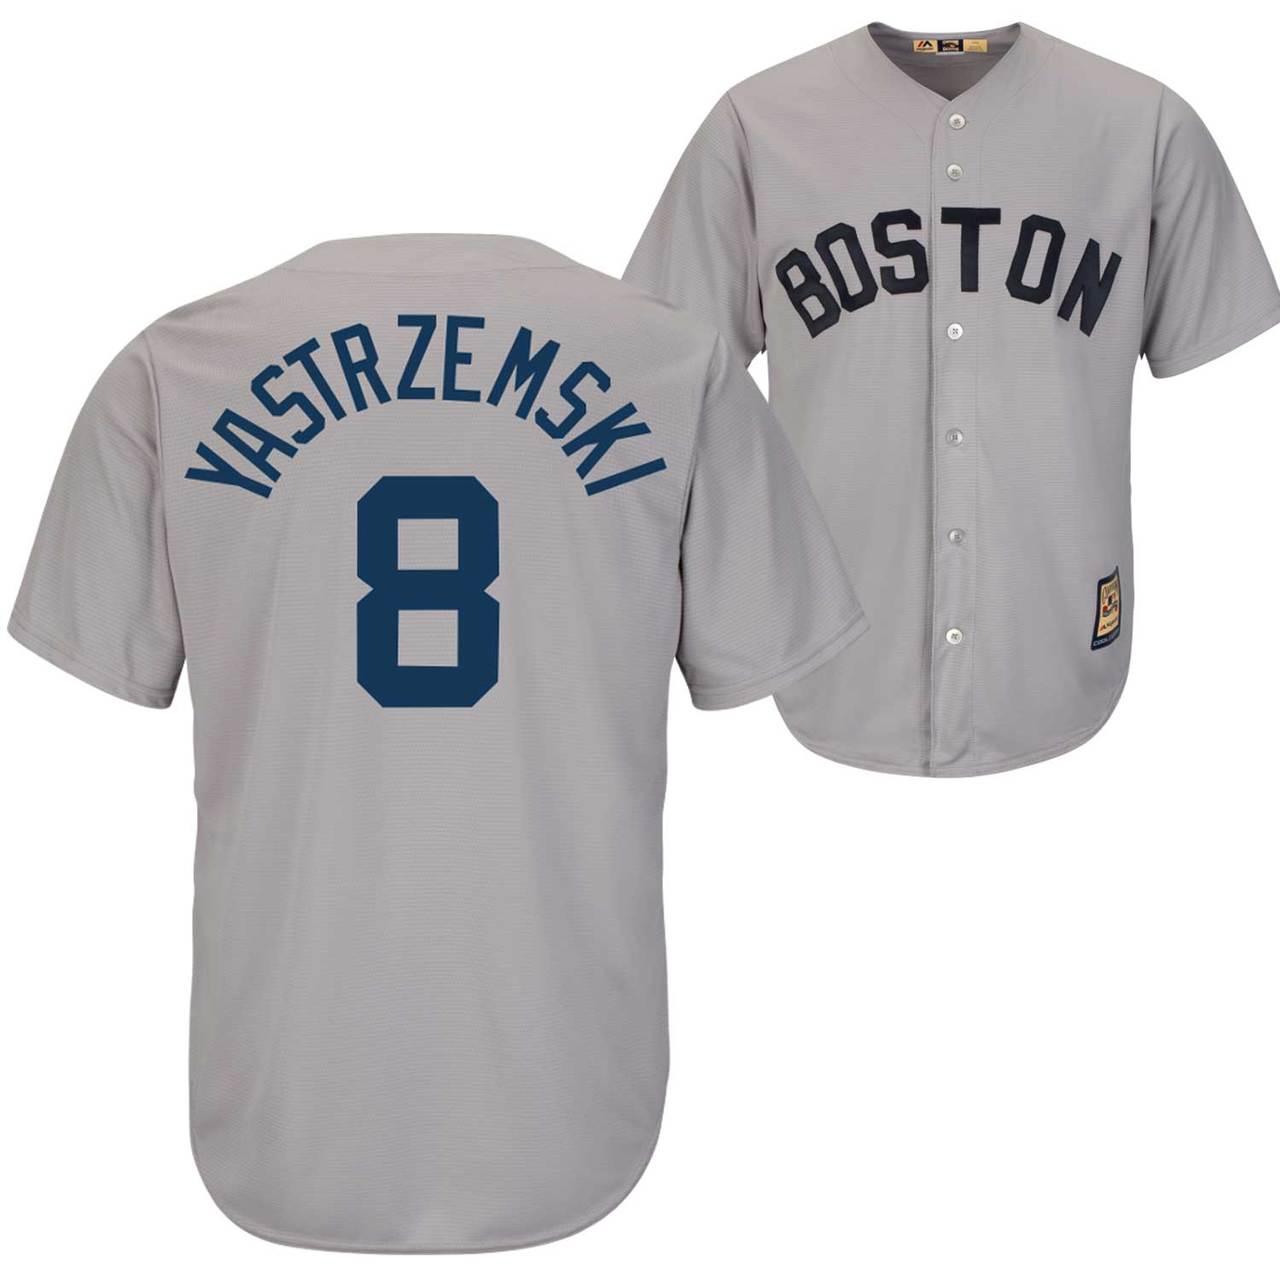 sports shoes dd11e 6a3c3 Carl Yastrzemski Jersey – Boston Red Sox Cooperstown ...